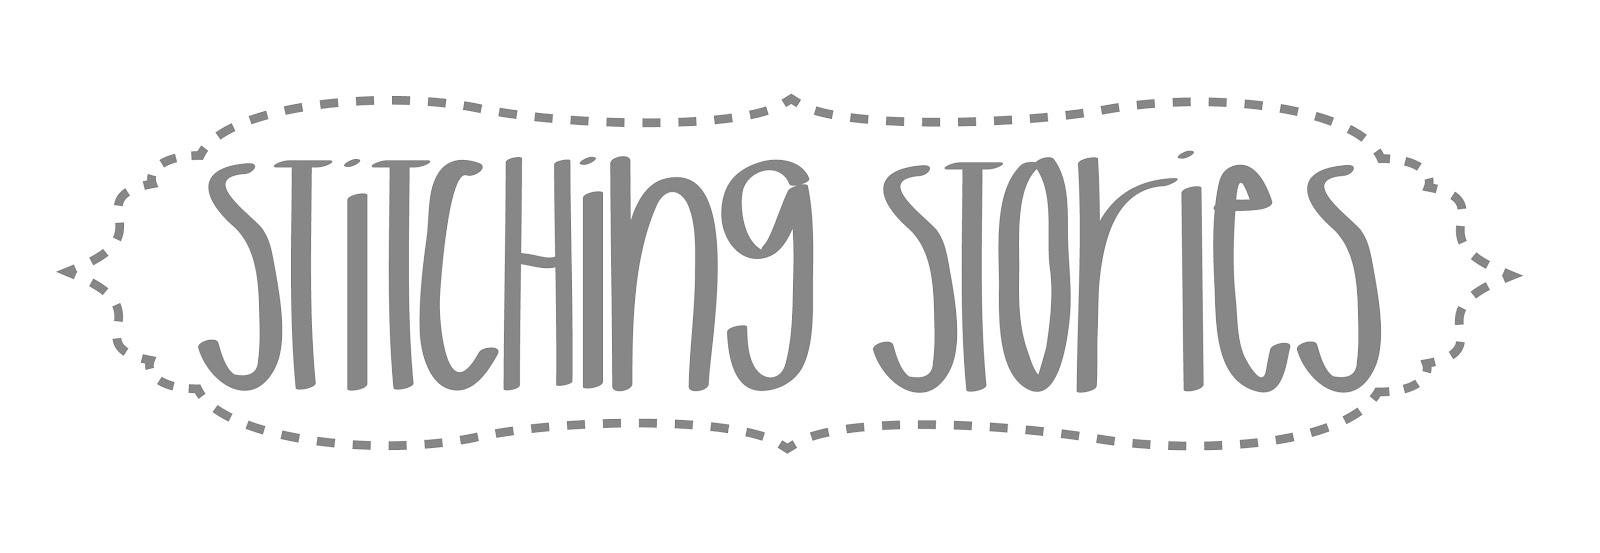 Stitching Stories